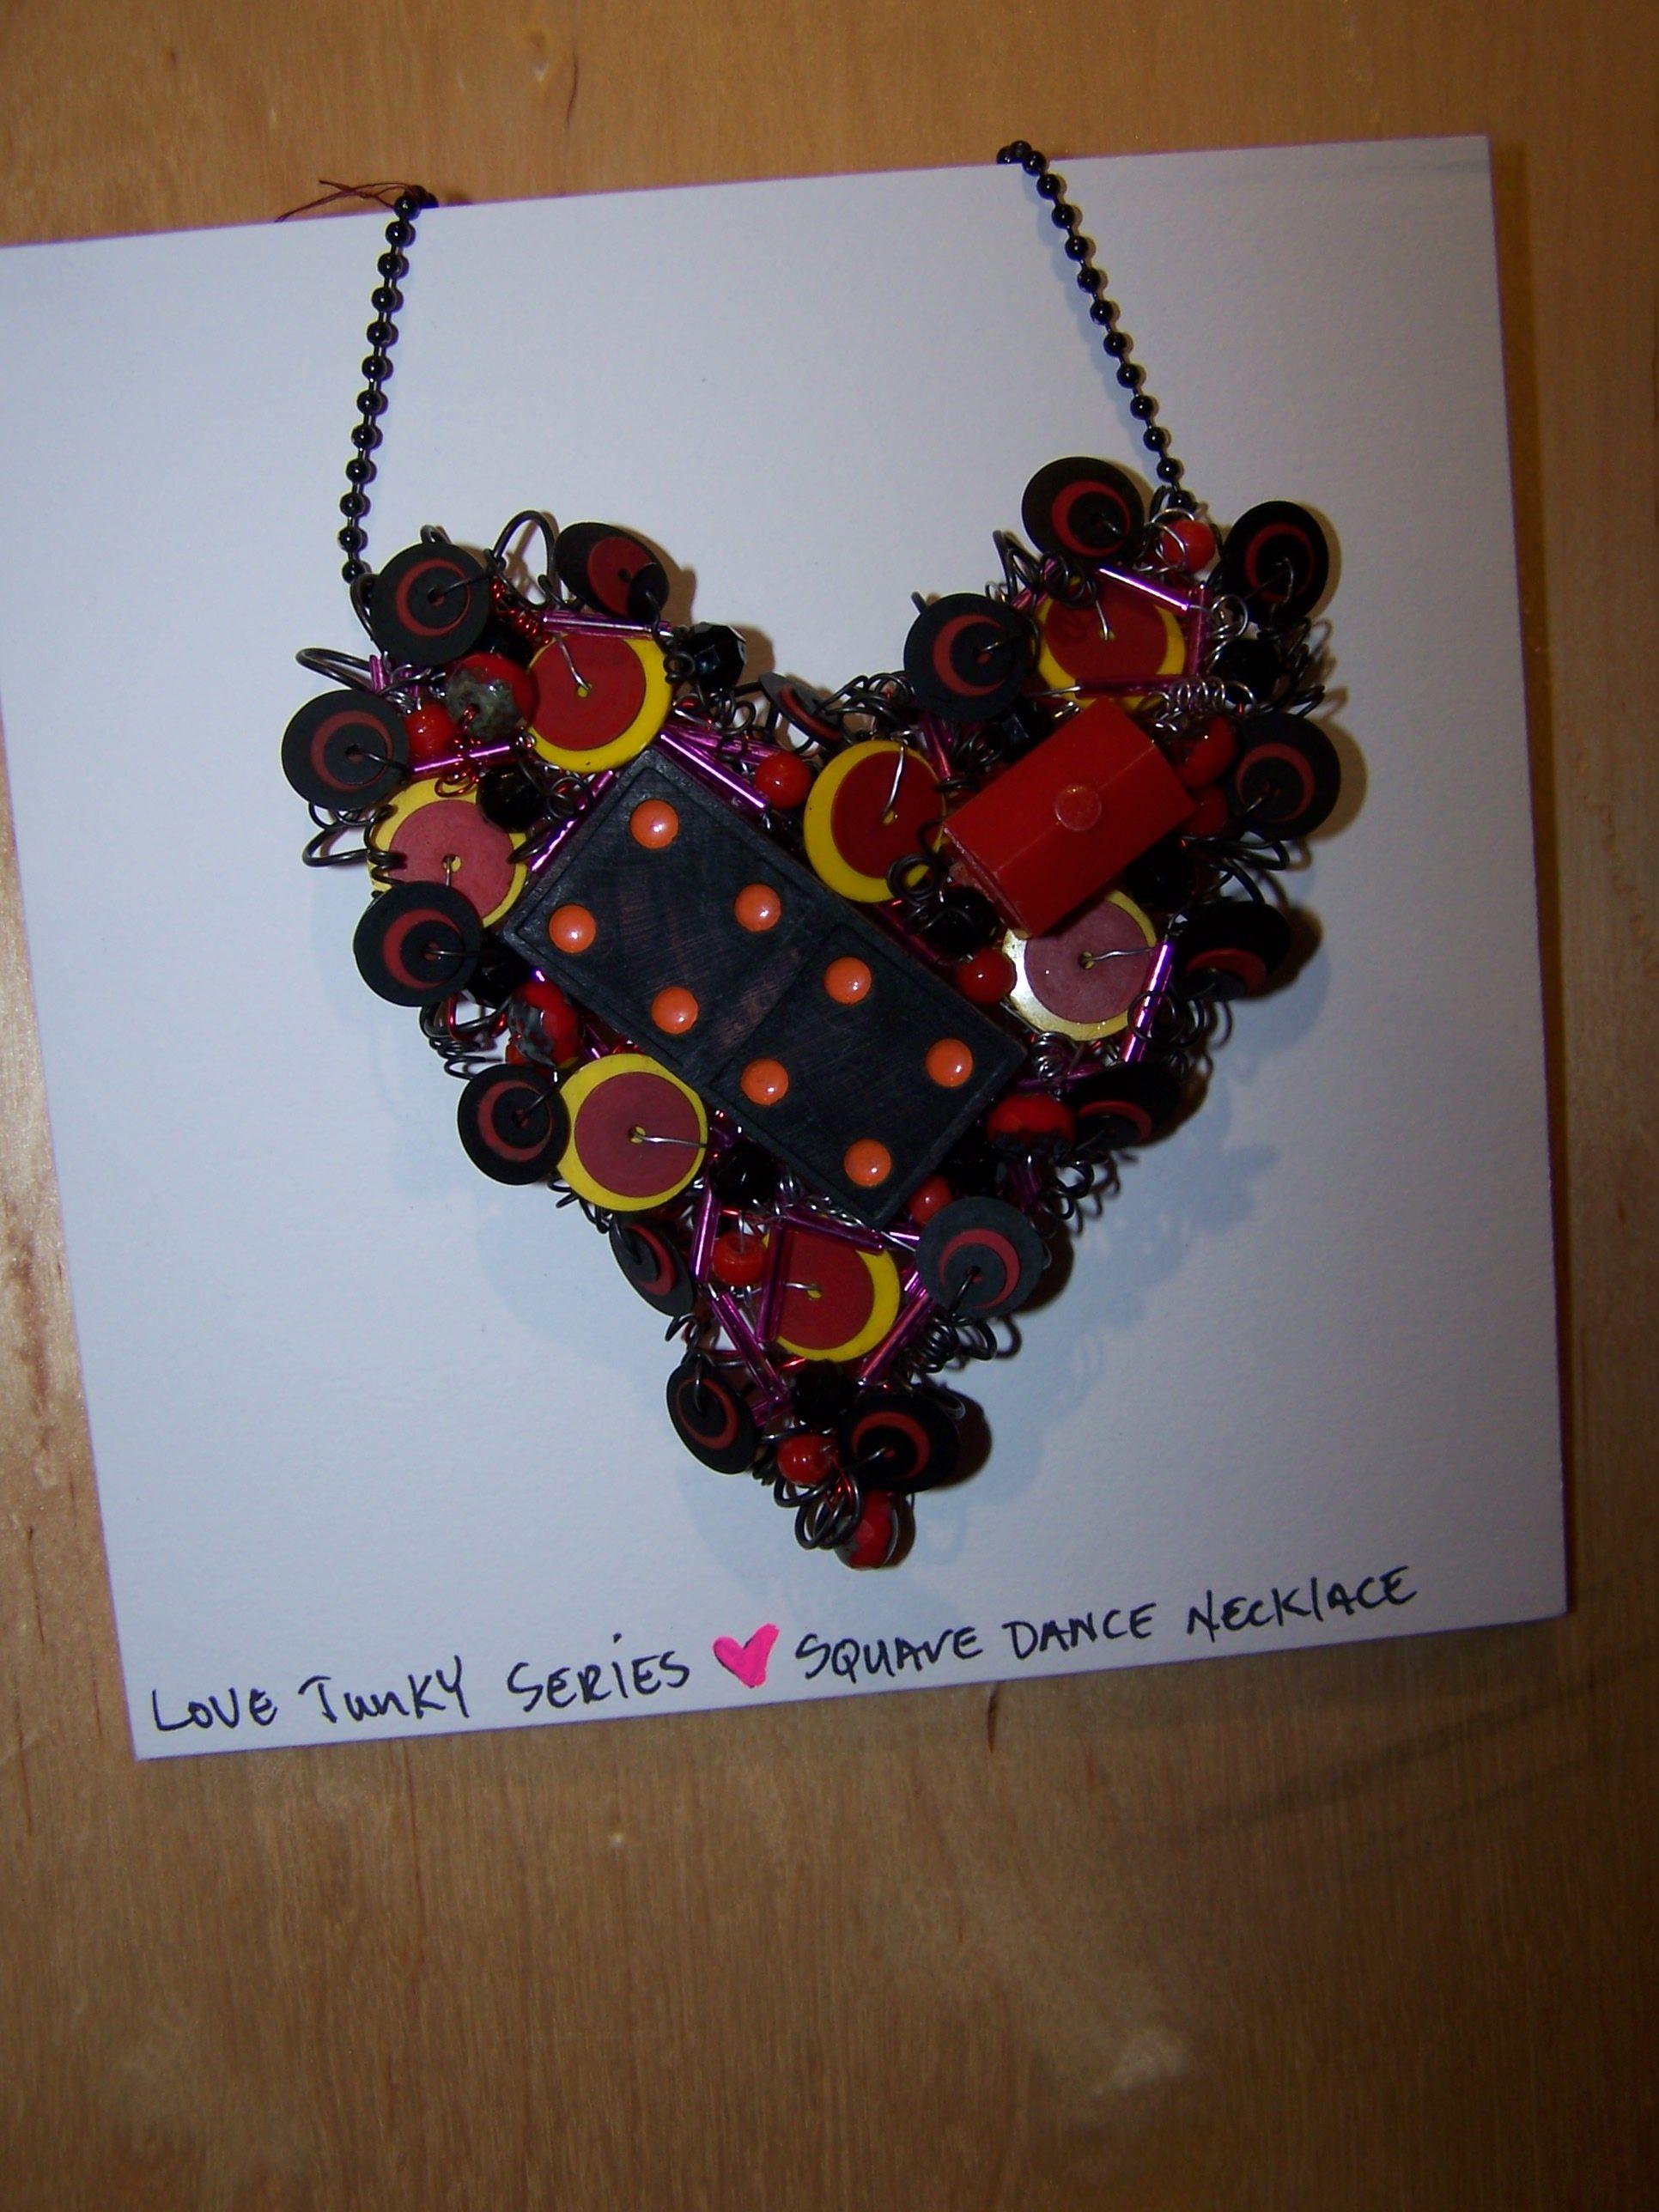 "Shannon Weber, Oregon Love Junk-Y Series ""Square dANCE"""